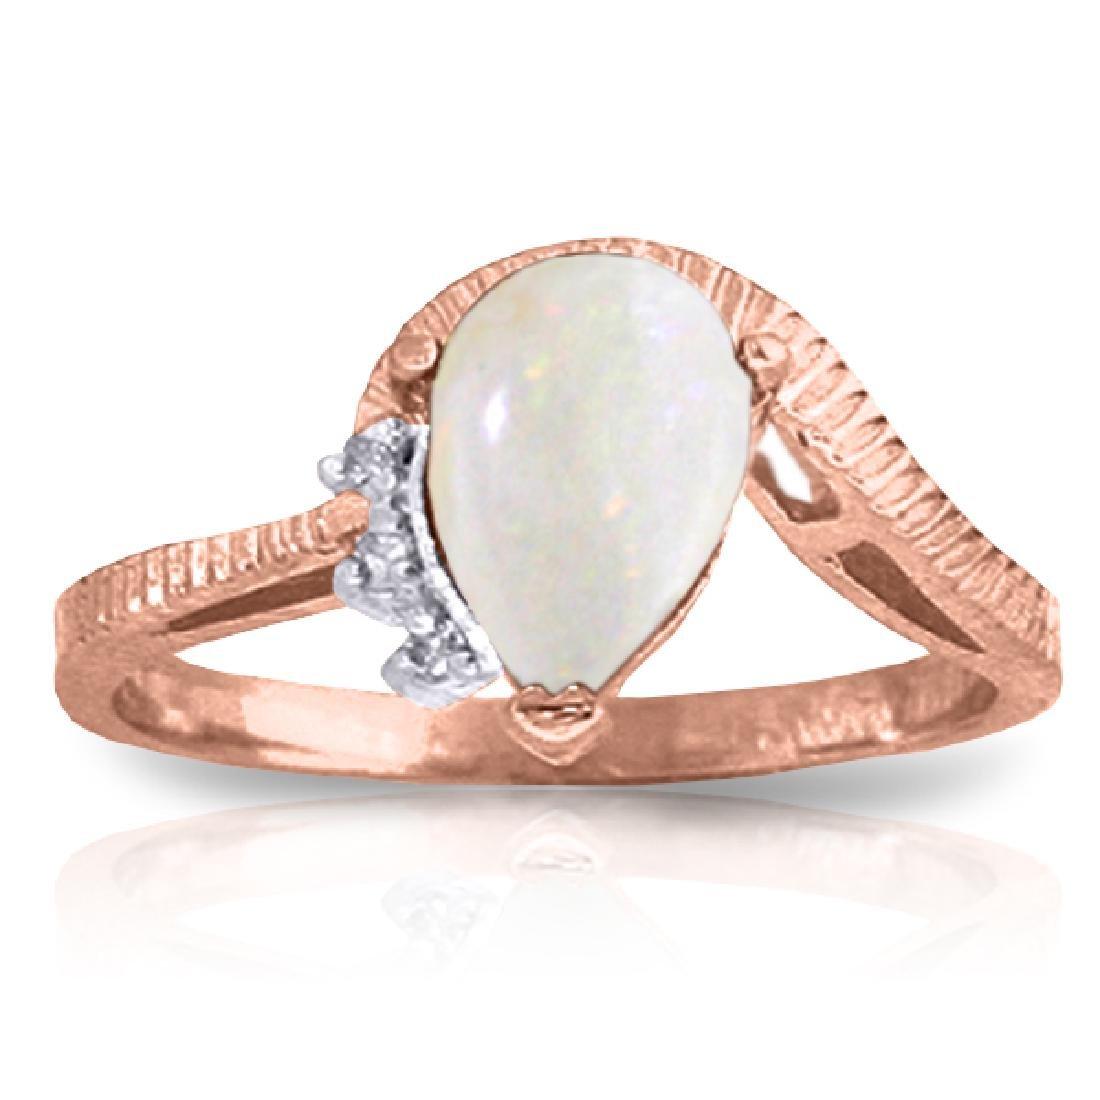 Genuine 0.79 ctw Opal & Diamond Ring Jewelry 14KT Rose